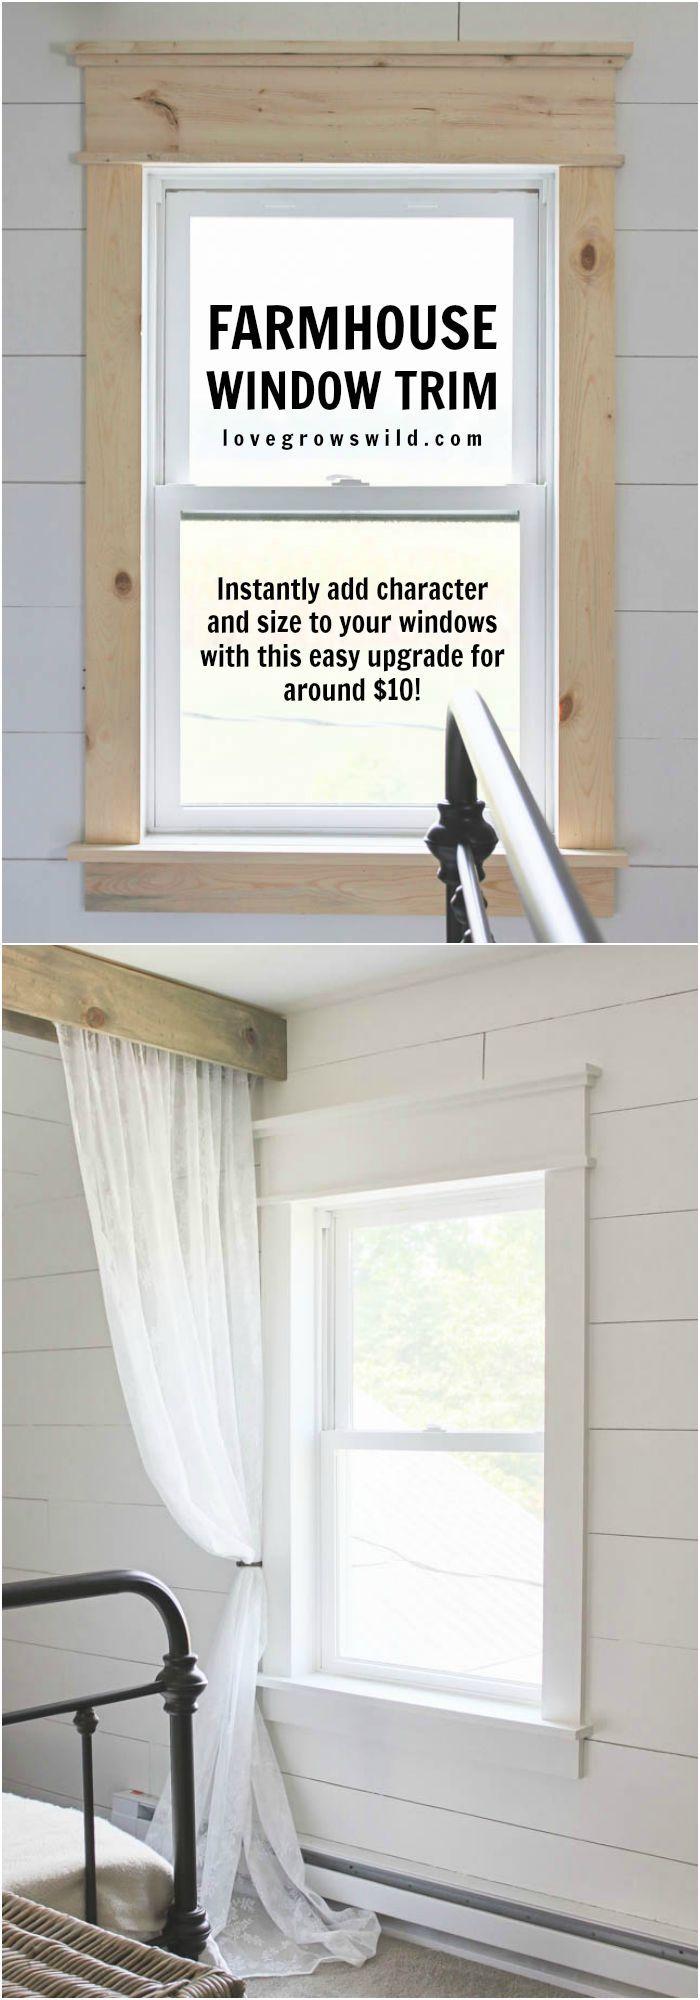 Farmhouse window trim window learning and easy farmhouse window trim amipublicfo Gallery